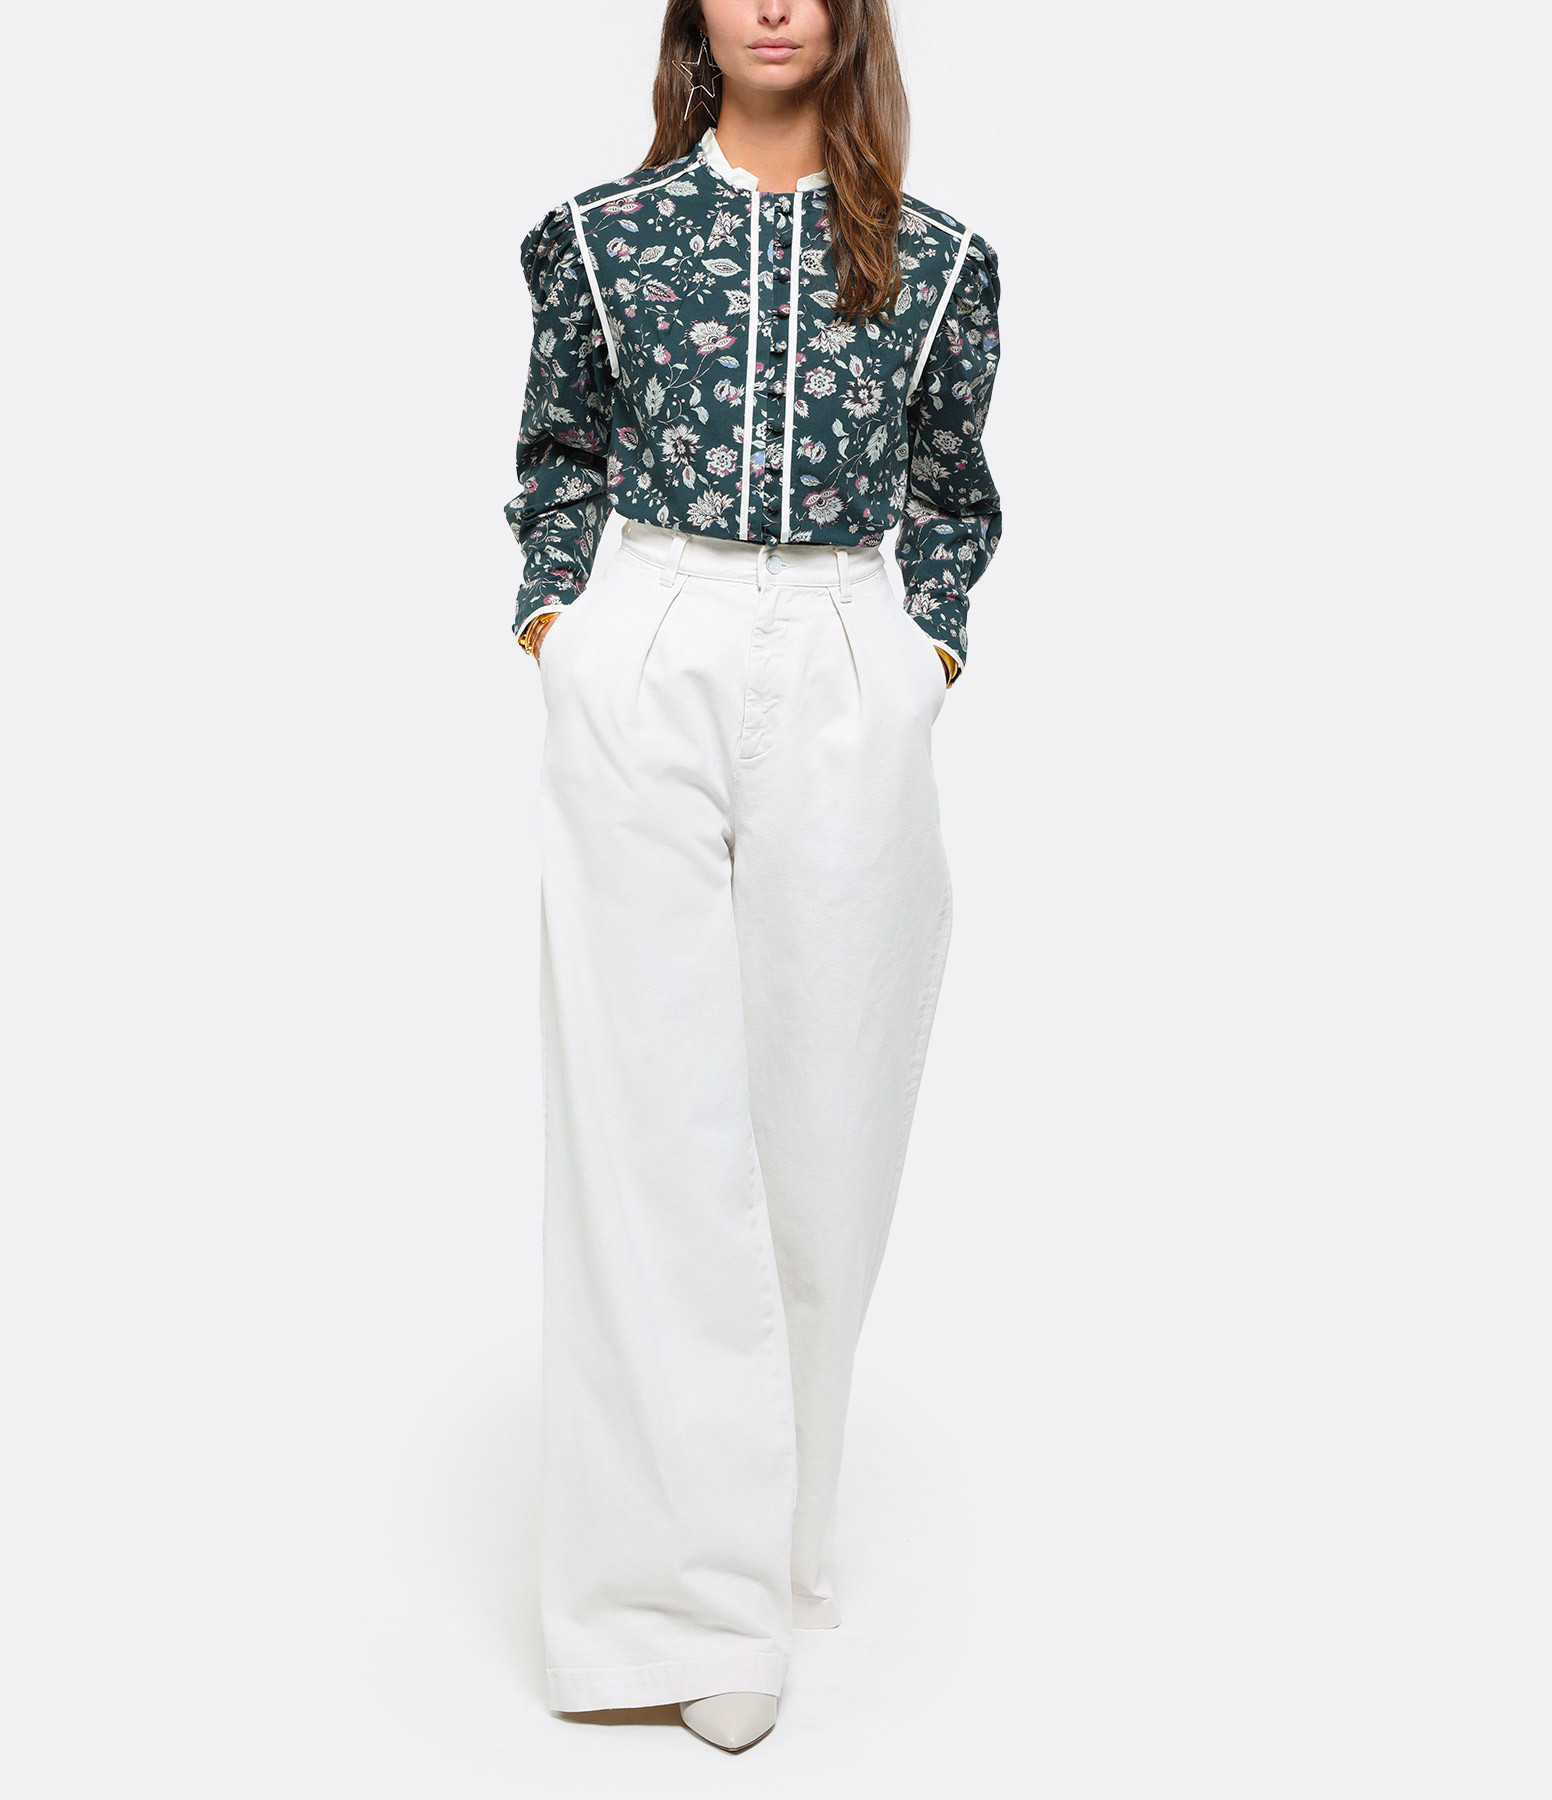 MADE IN TOMBOY - Pantalon Denim Enea Ivoire